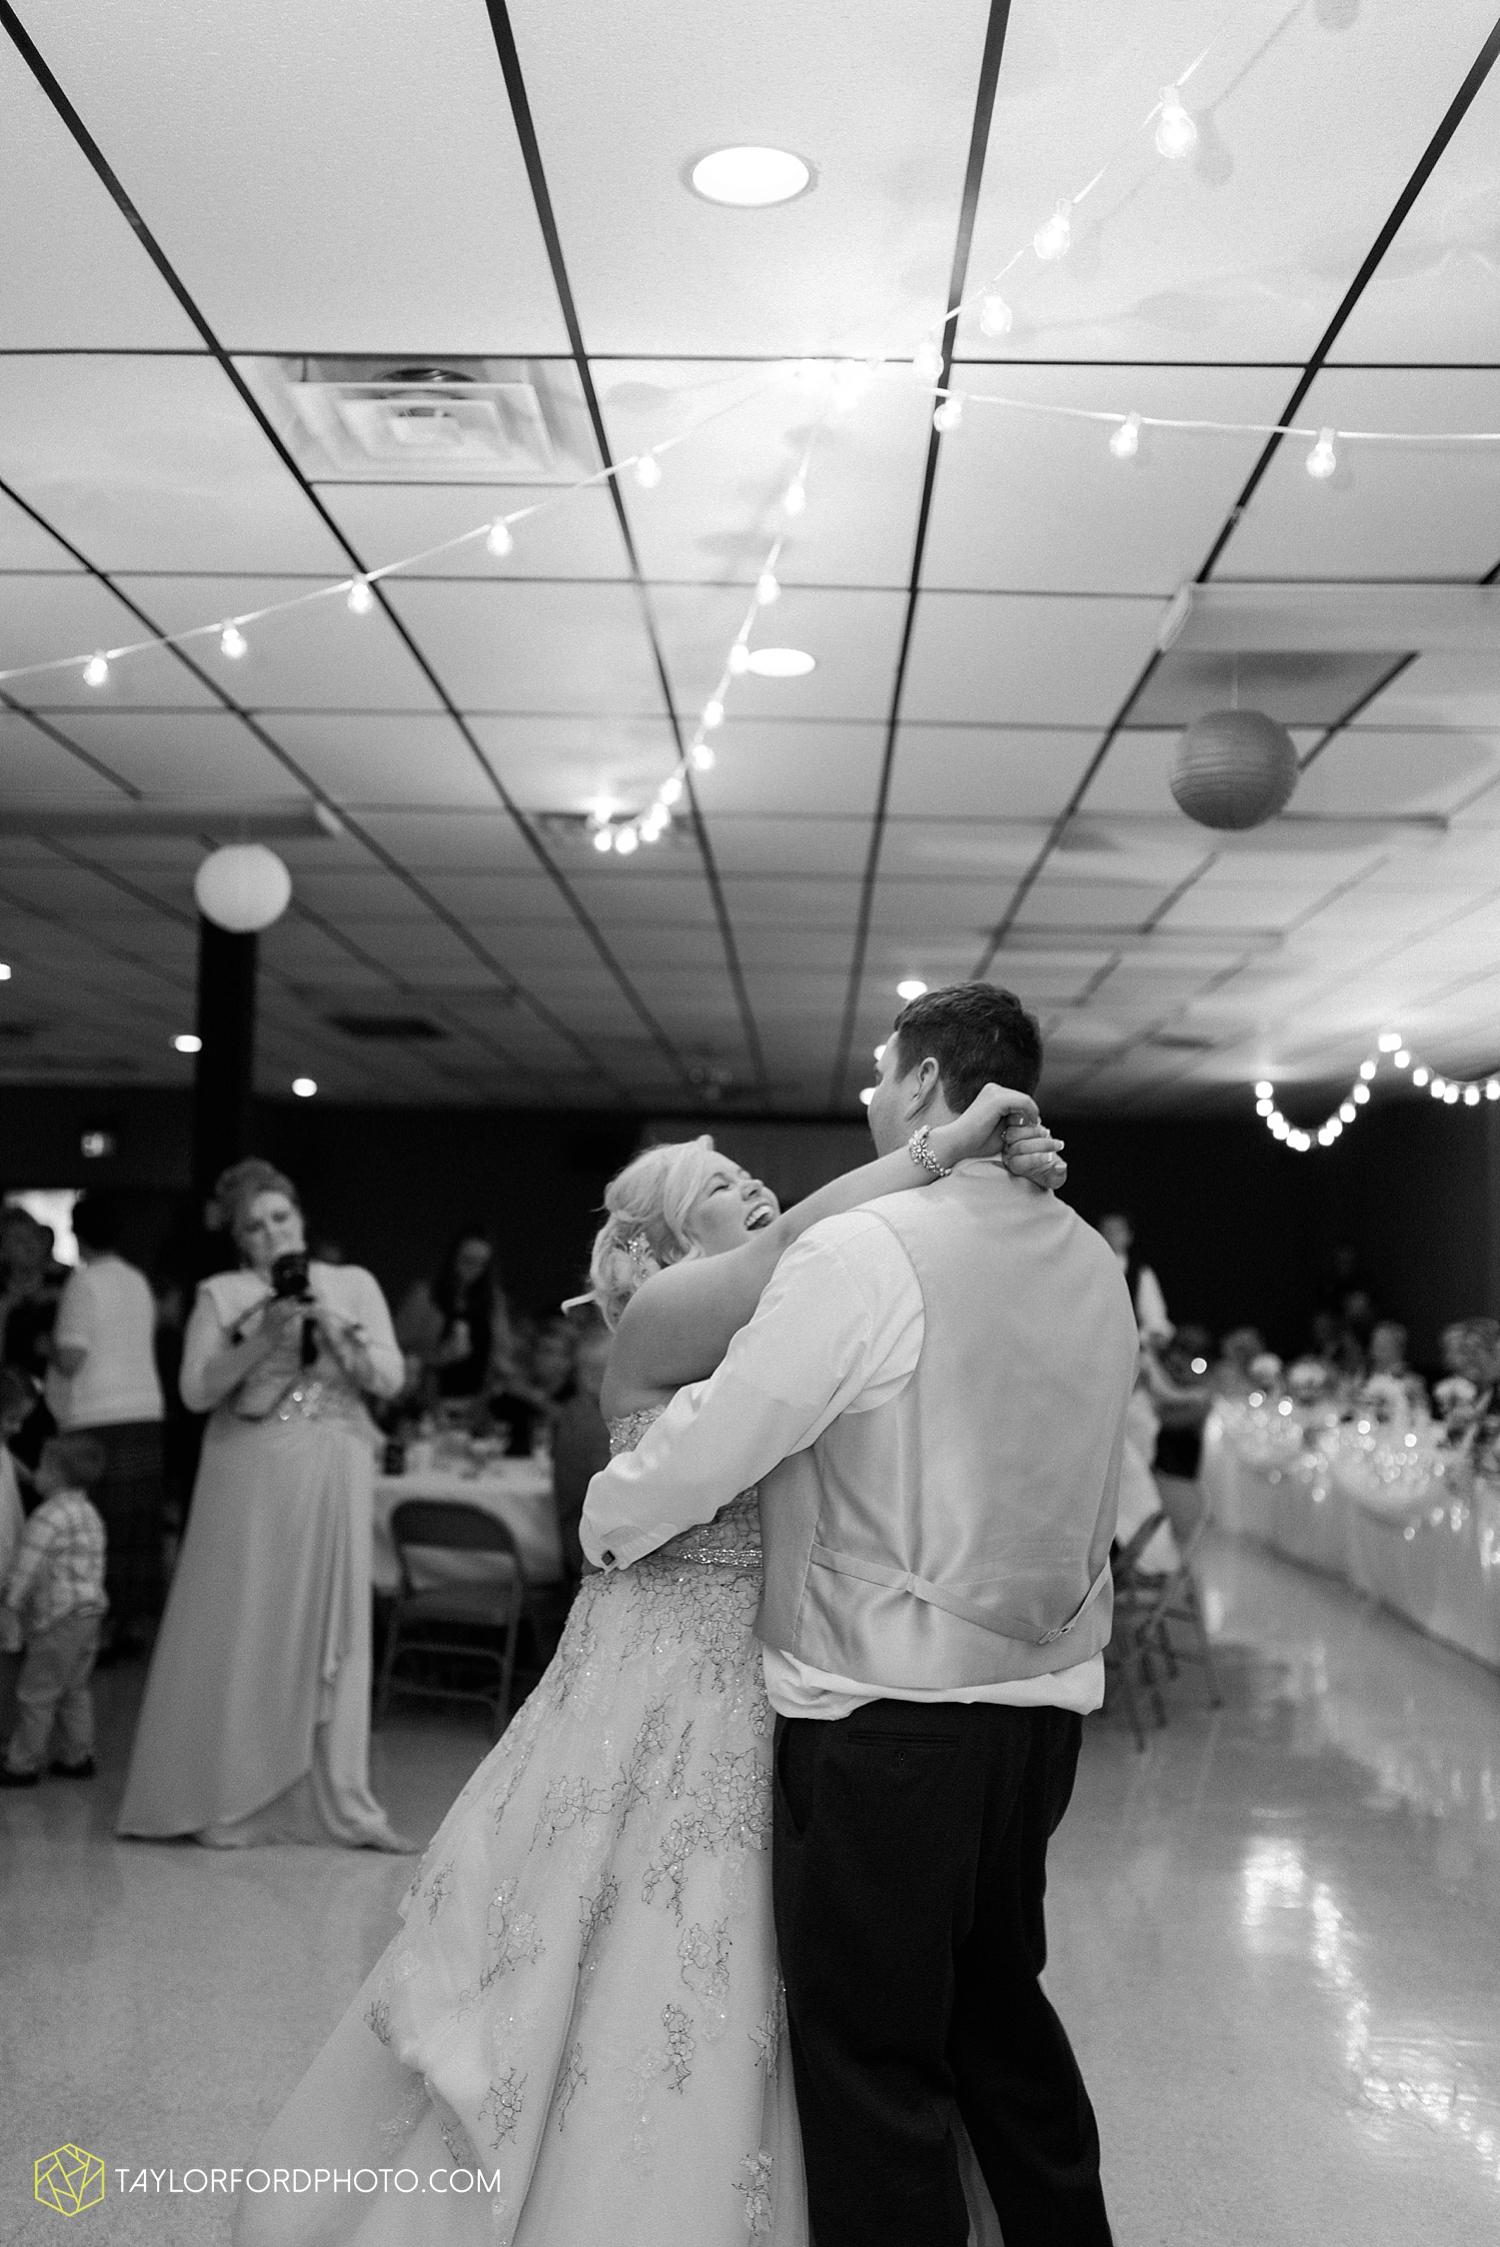 van_wert_ohio_wedding_photographer_taylor_ford_1305.jpg